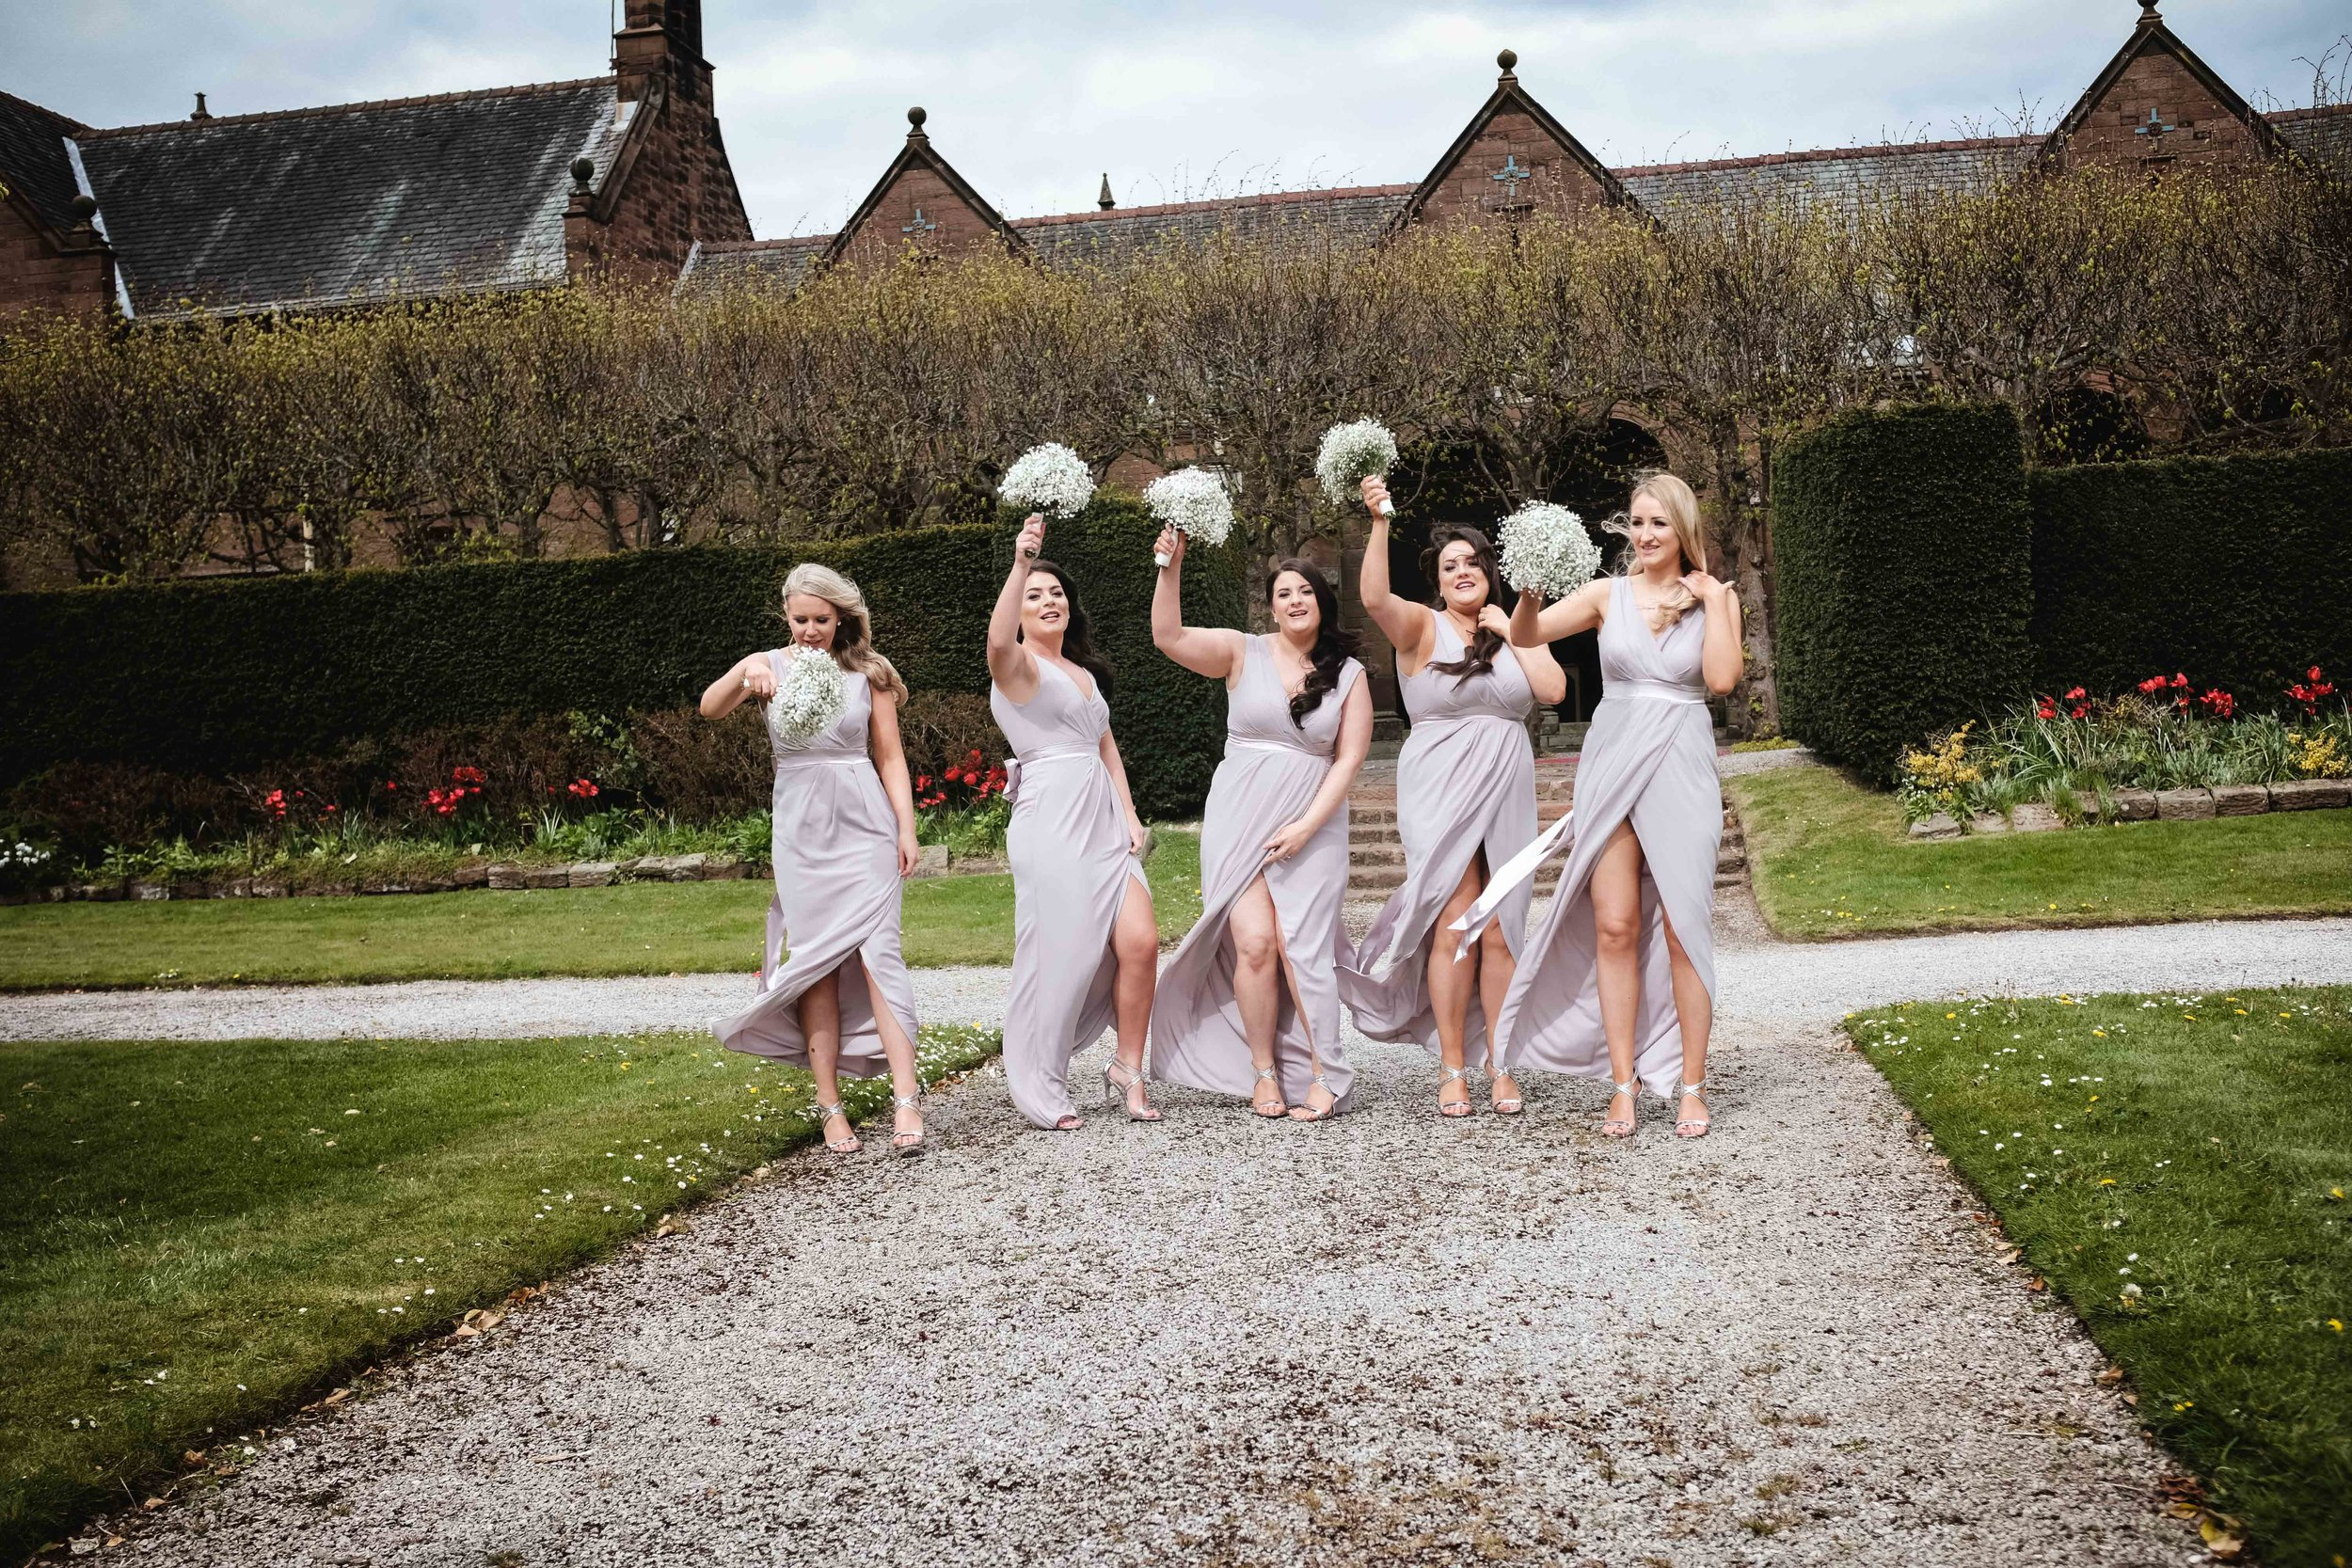 Thornton manor wedding photography cheshire wedding photographer liverpool manchester warrington chester wirral wedding BLOG (53 of 108).jpg